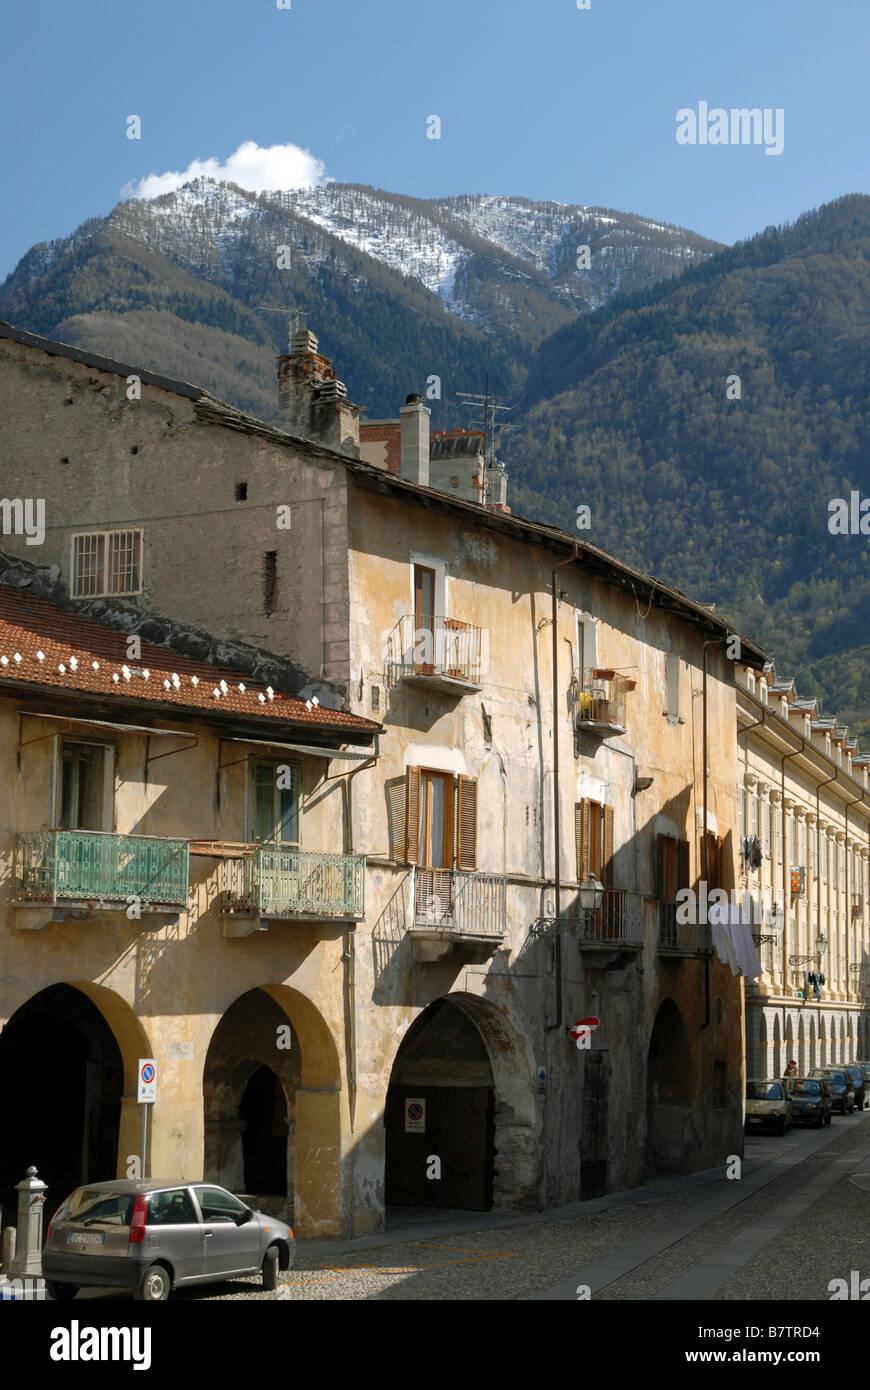 Via Martiri della Liberta as seen from Piazza San Giusto, Susa, Piedmont, Italy. Stock Photo